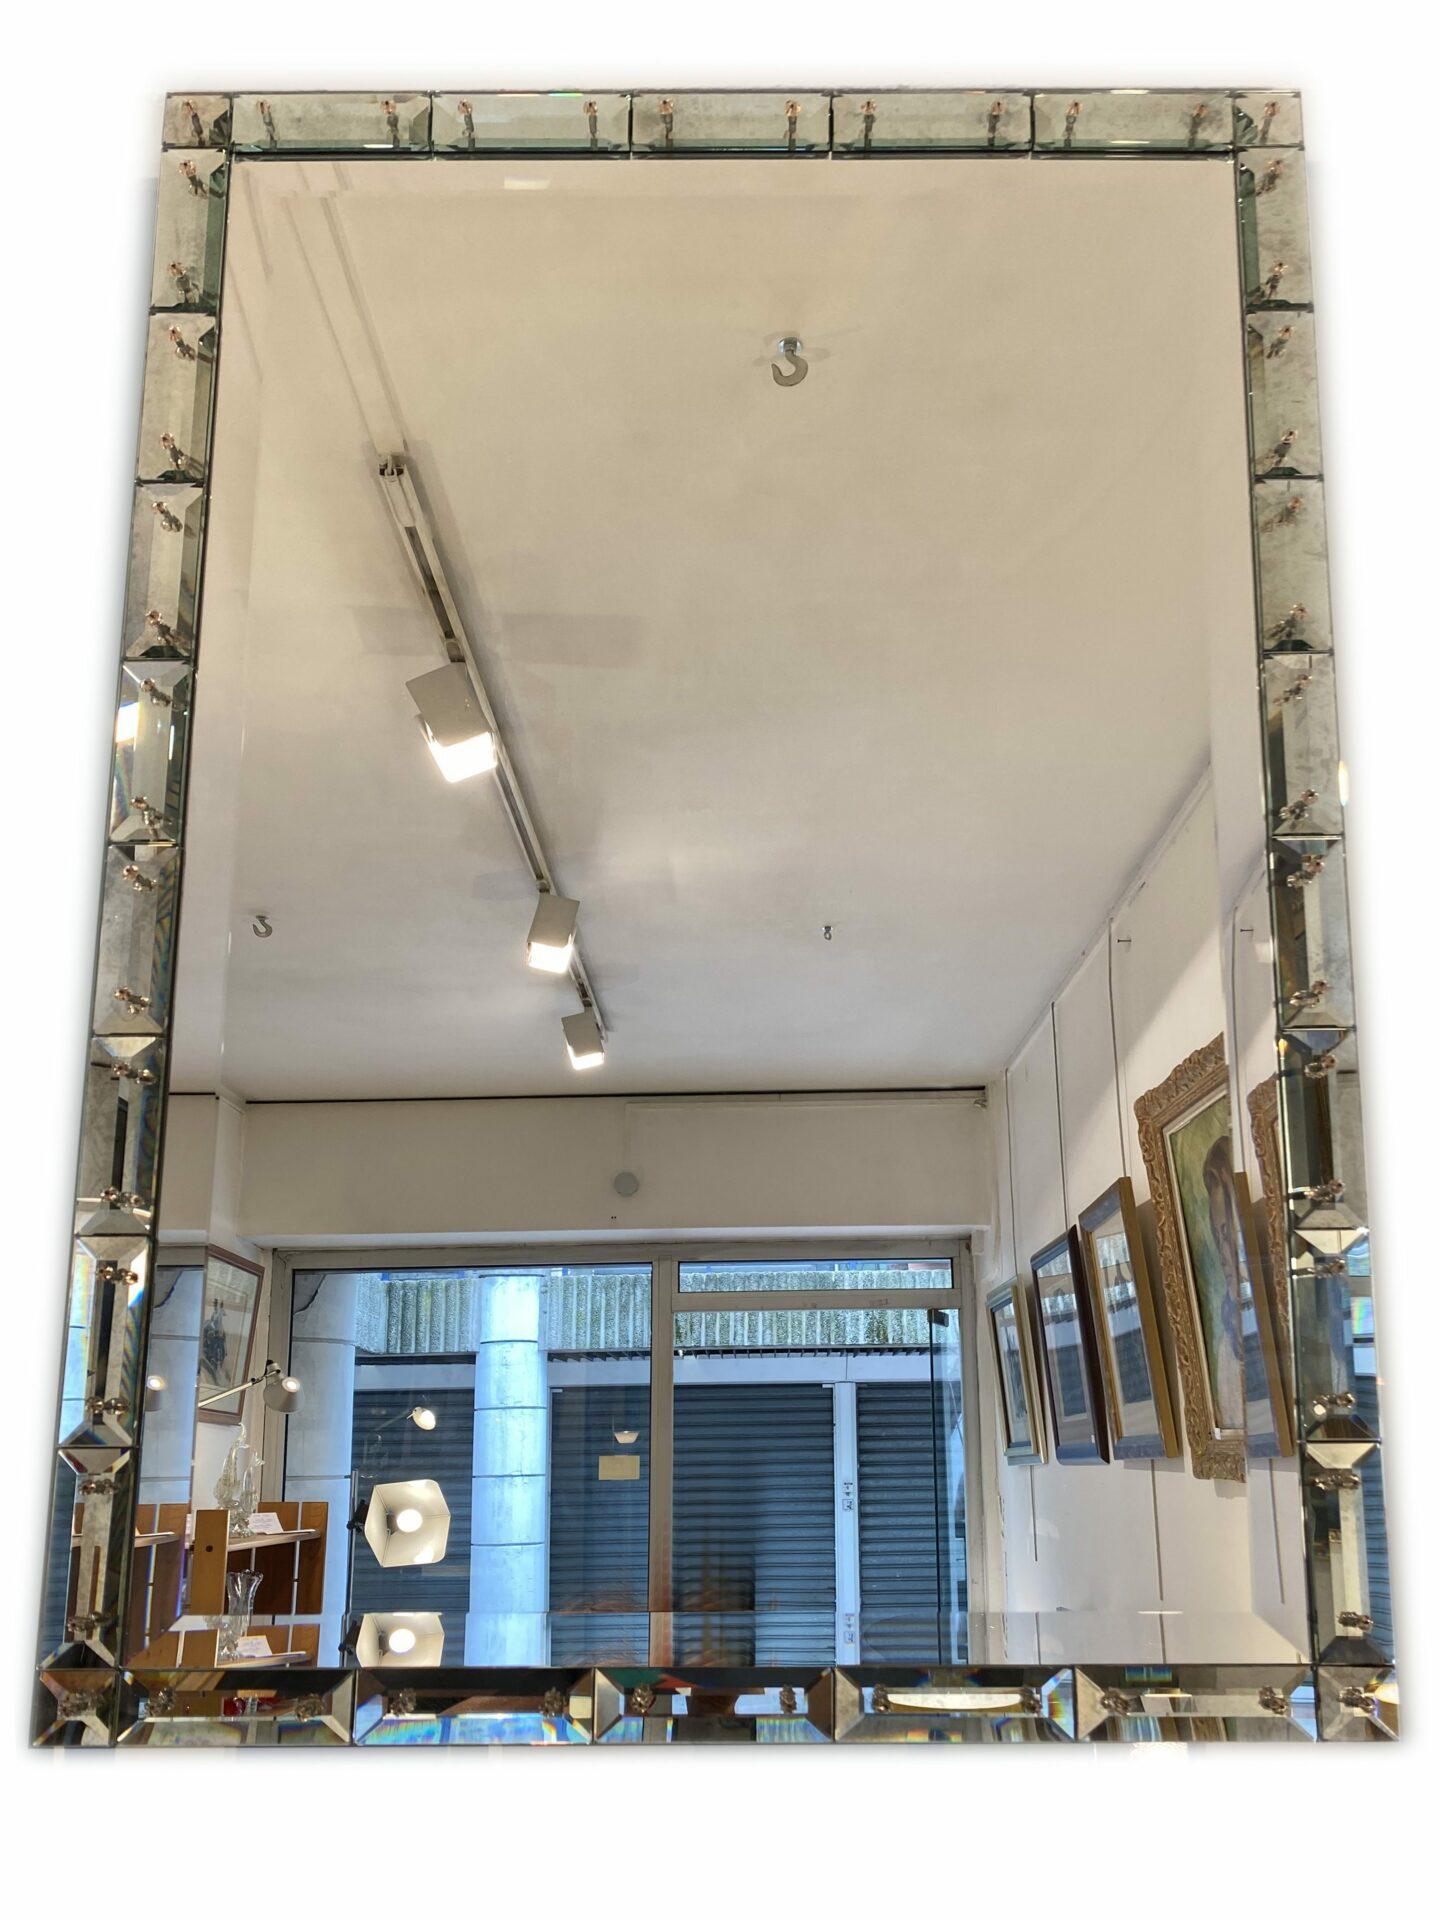 Miroir Murano - Pourtour Murano taillé